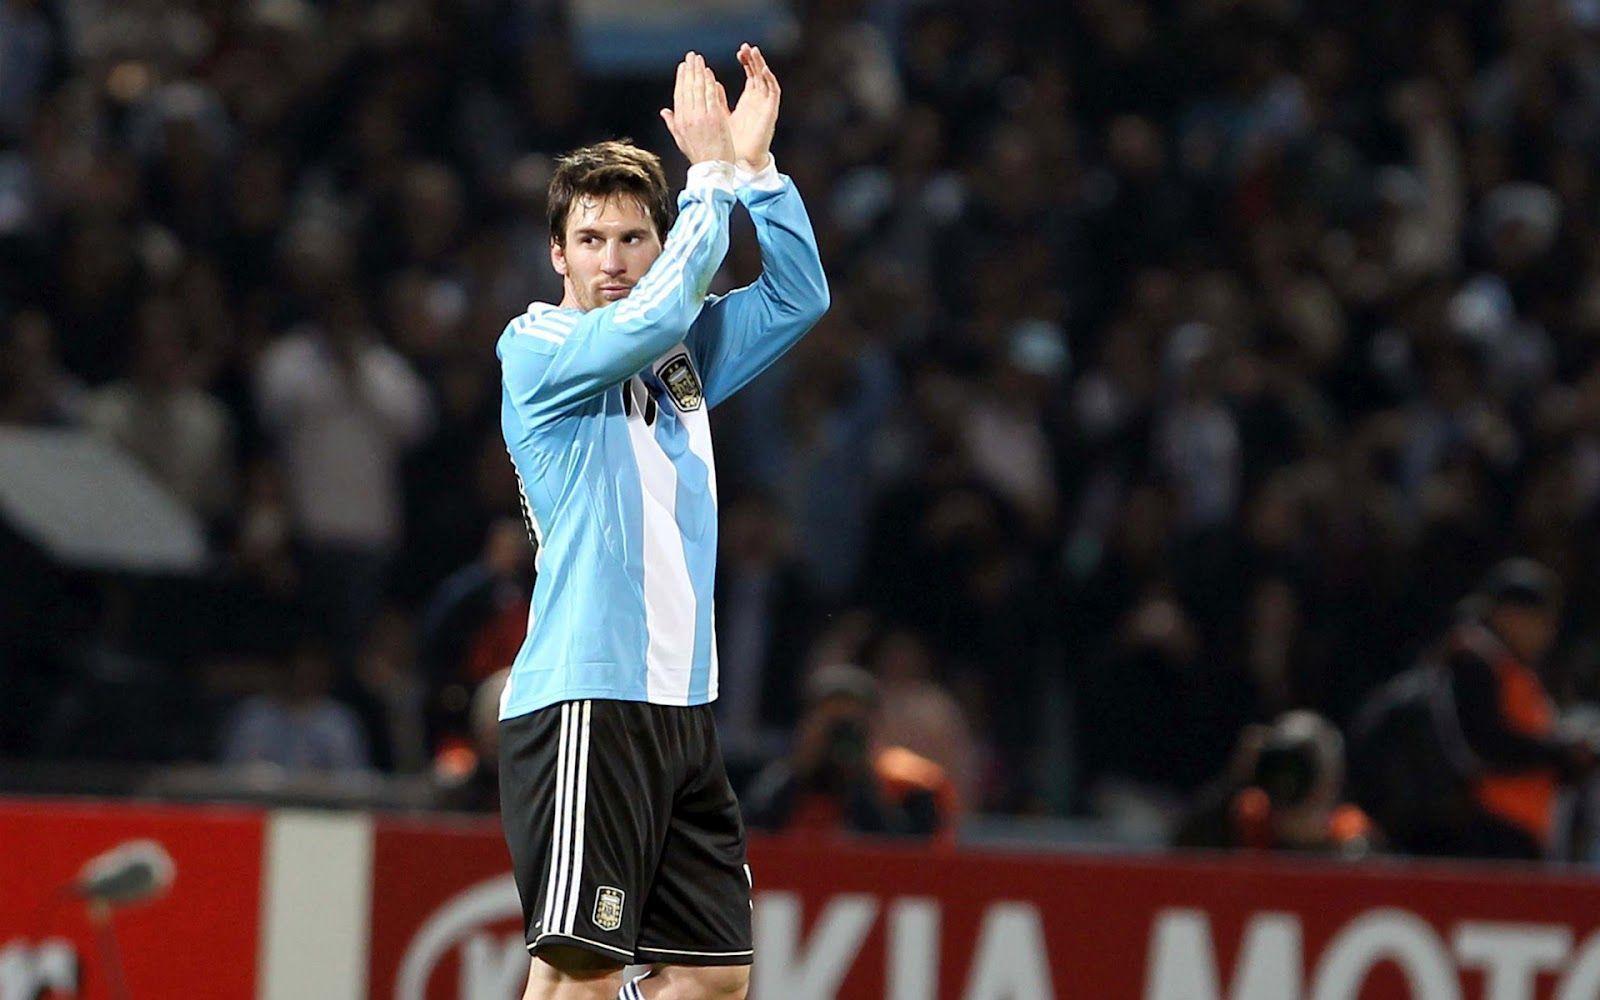 Lionel Messi HD Wallpapers - Celebrities HD Wallpapers